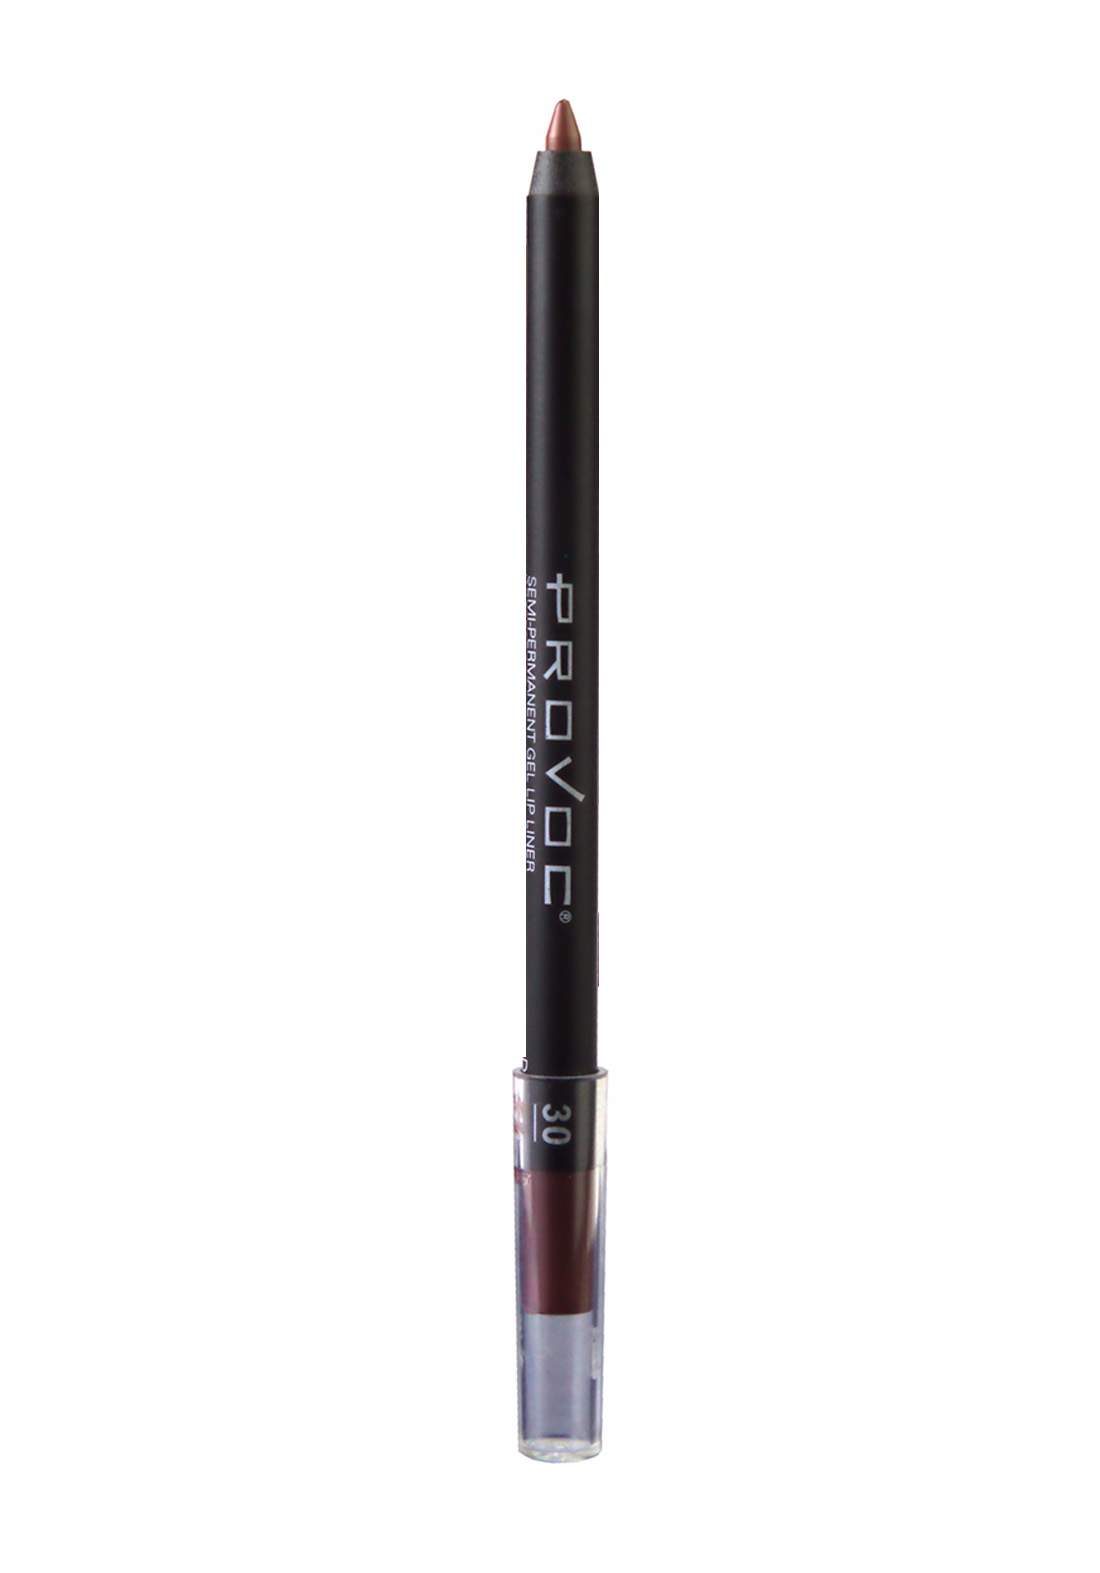 Provoc 353-0079 Semi-Permanent Gel Lip Liner Pencil No.30 Desired محدد الشفاه